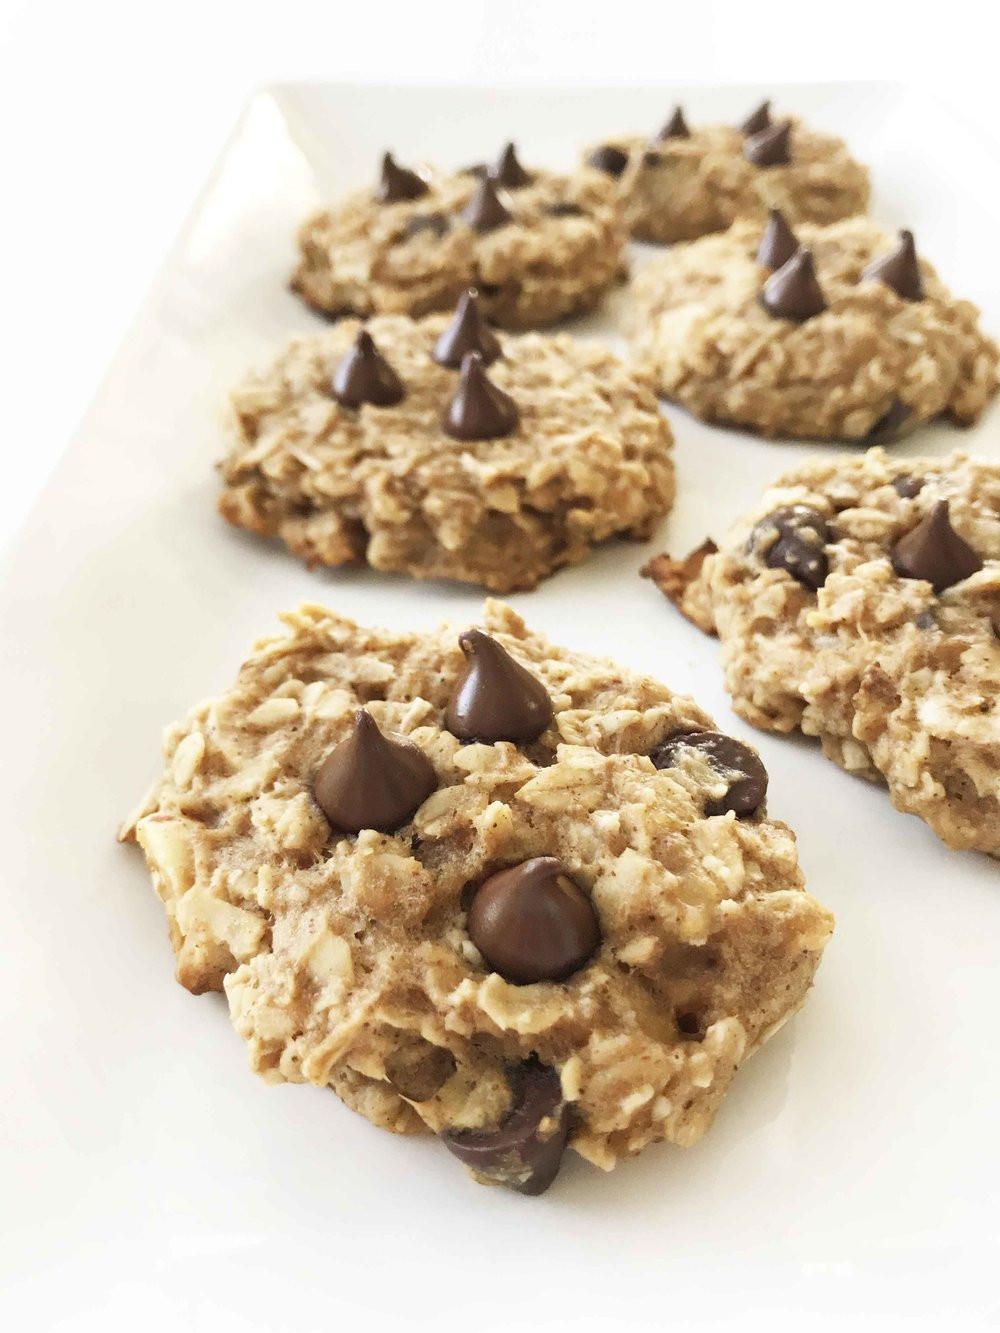 Healthy Oatmeal Cookies Applesauce  Healthy Peanut Butter Oatmeal Cookies — The Skinny Fork